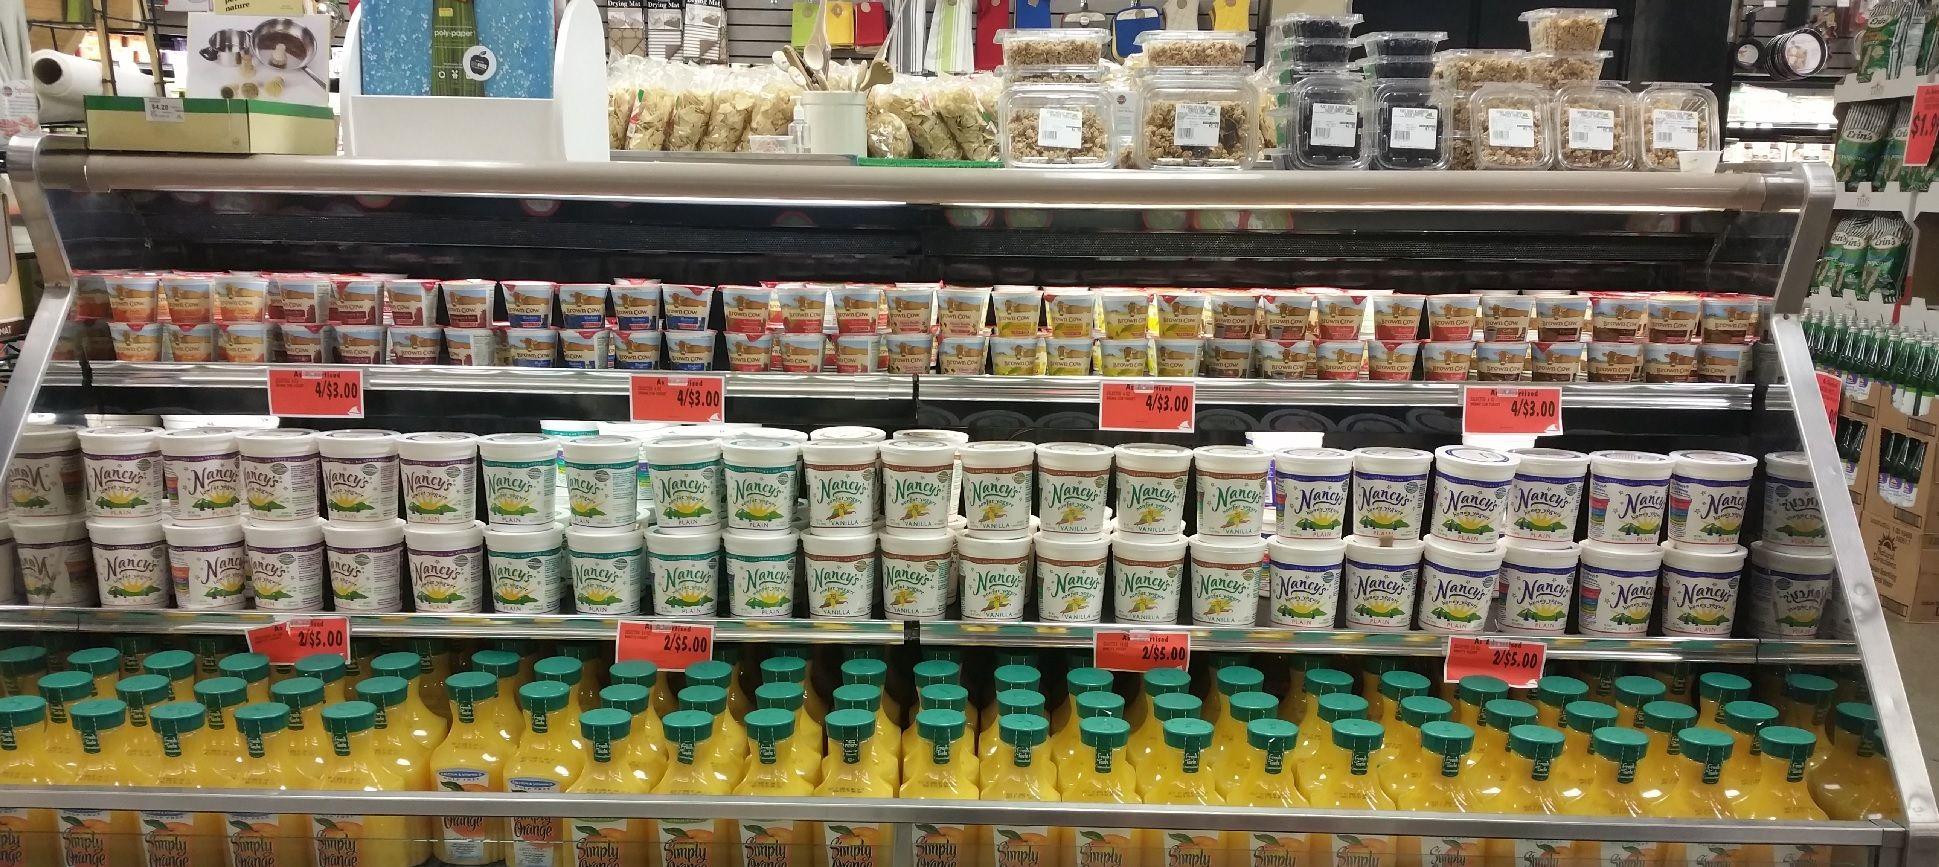 ballard market, seattle (wa) | nancy's far and wide | pinterest